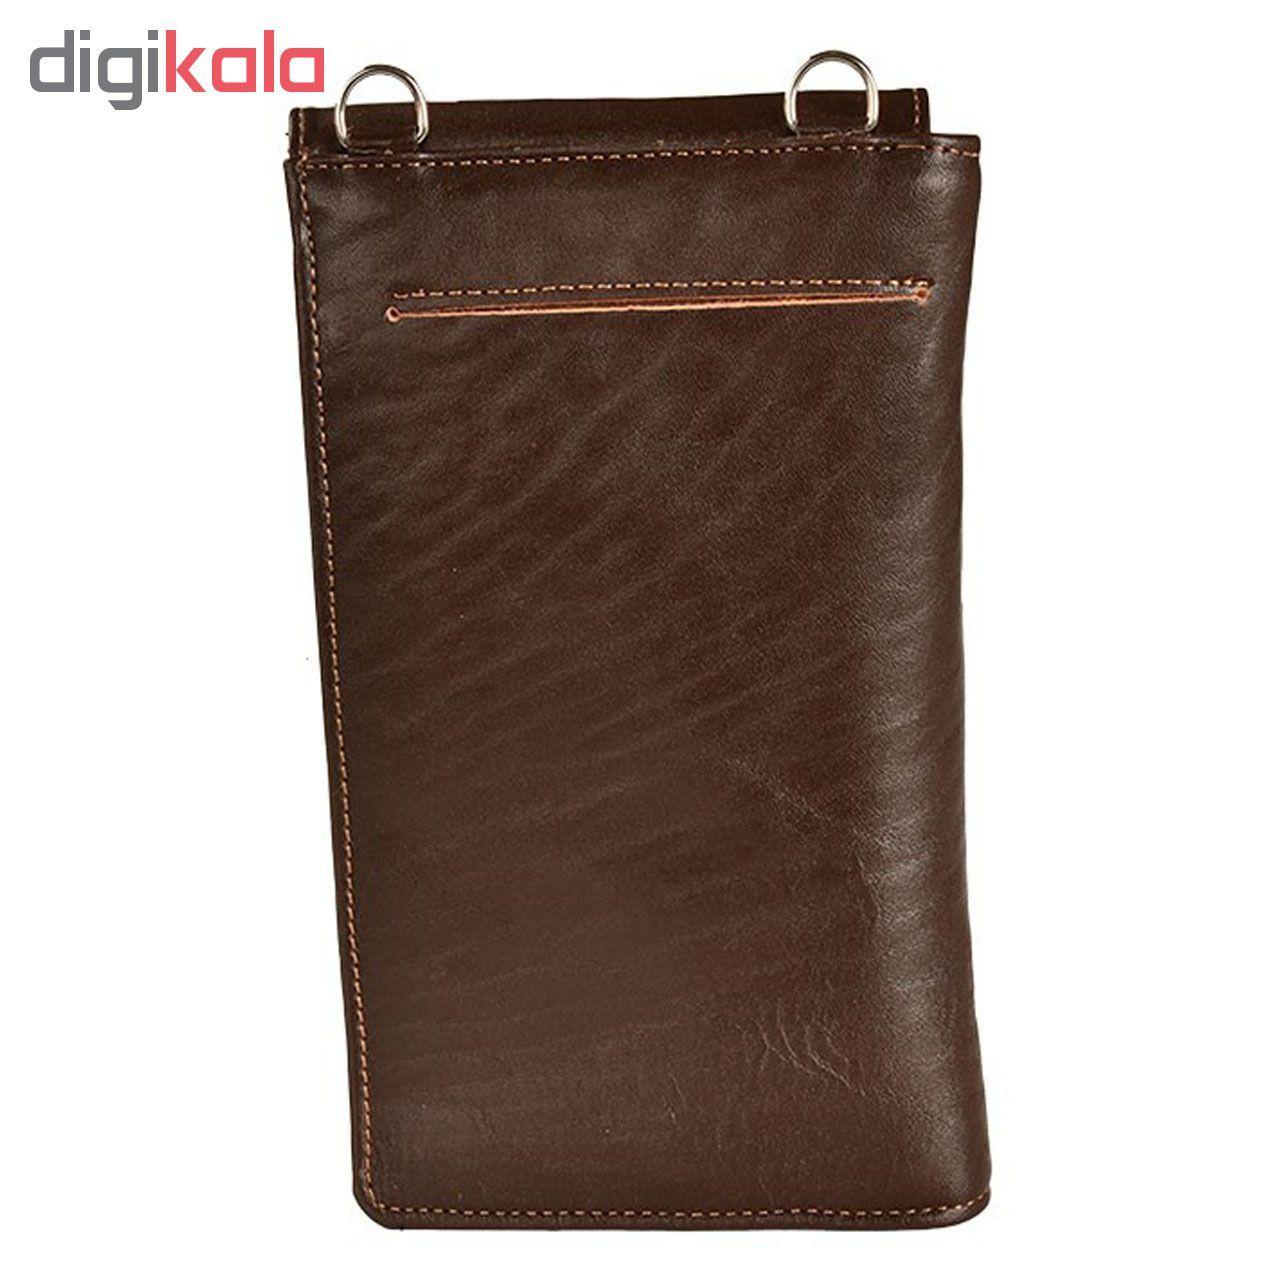 کیف پاسپورتی مردانه کهن چرم مدل PS13-1 main 1 11